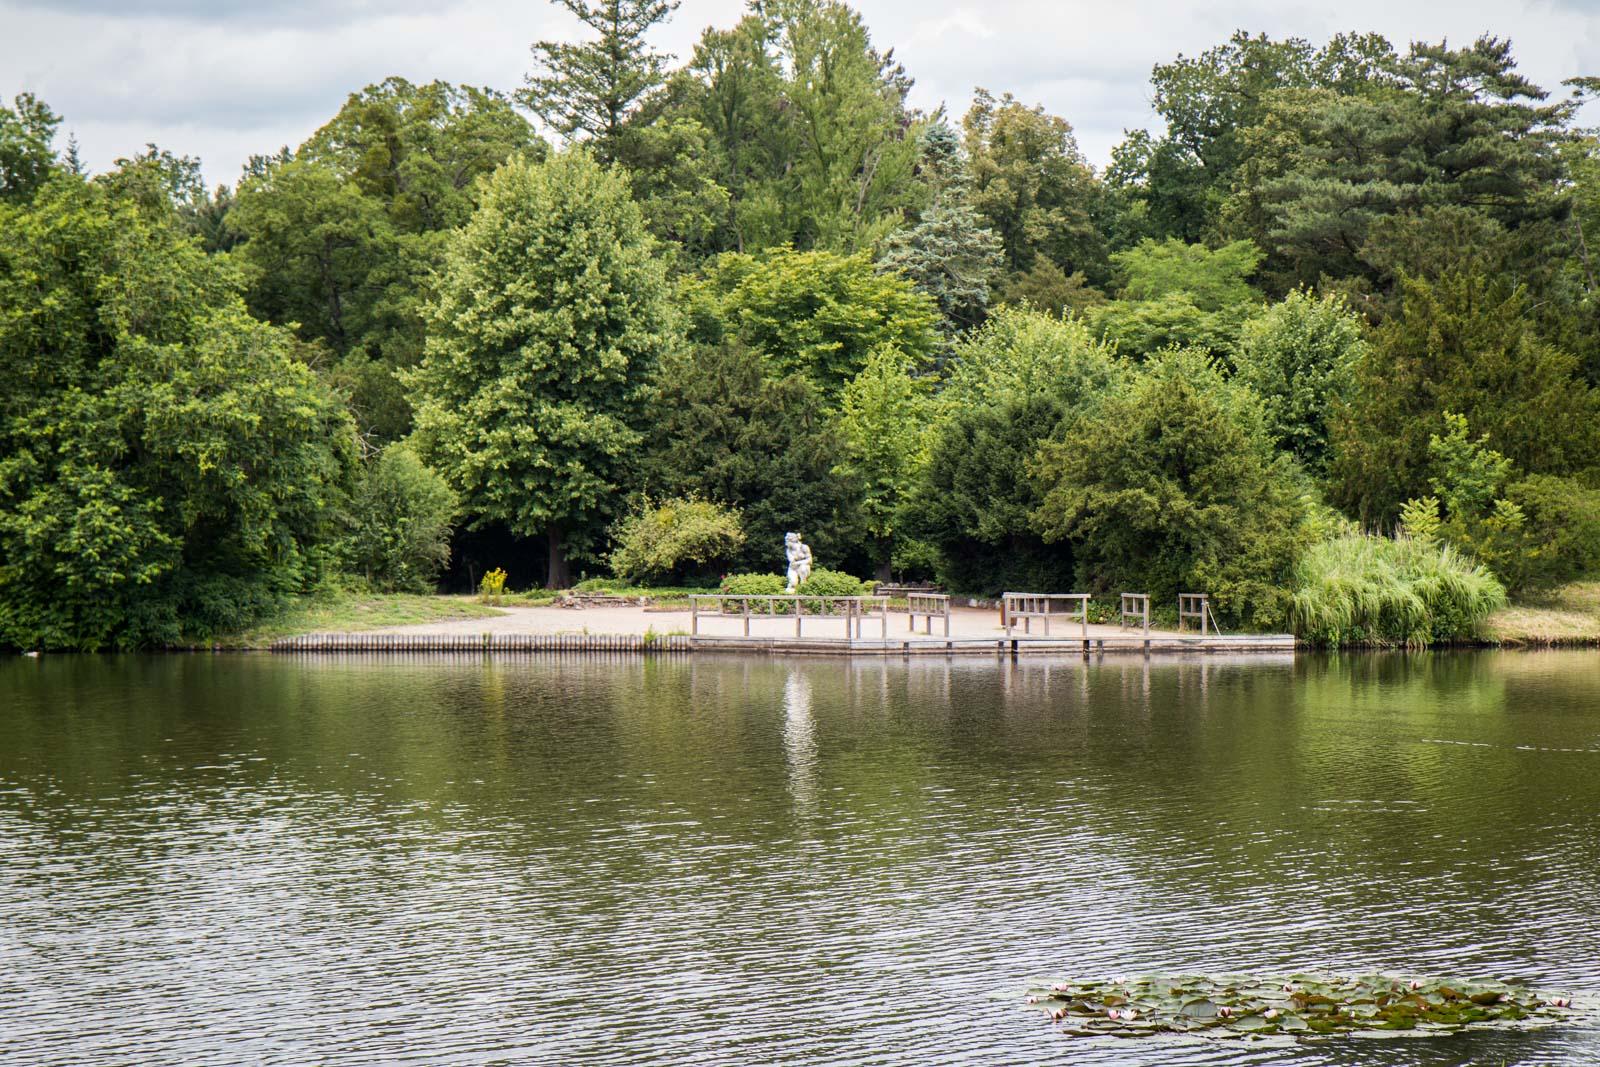 Garden Kingdom of Dessau-Wörlitz, Dessau, Germany